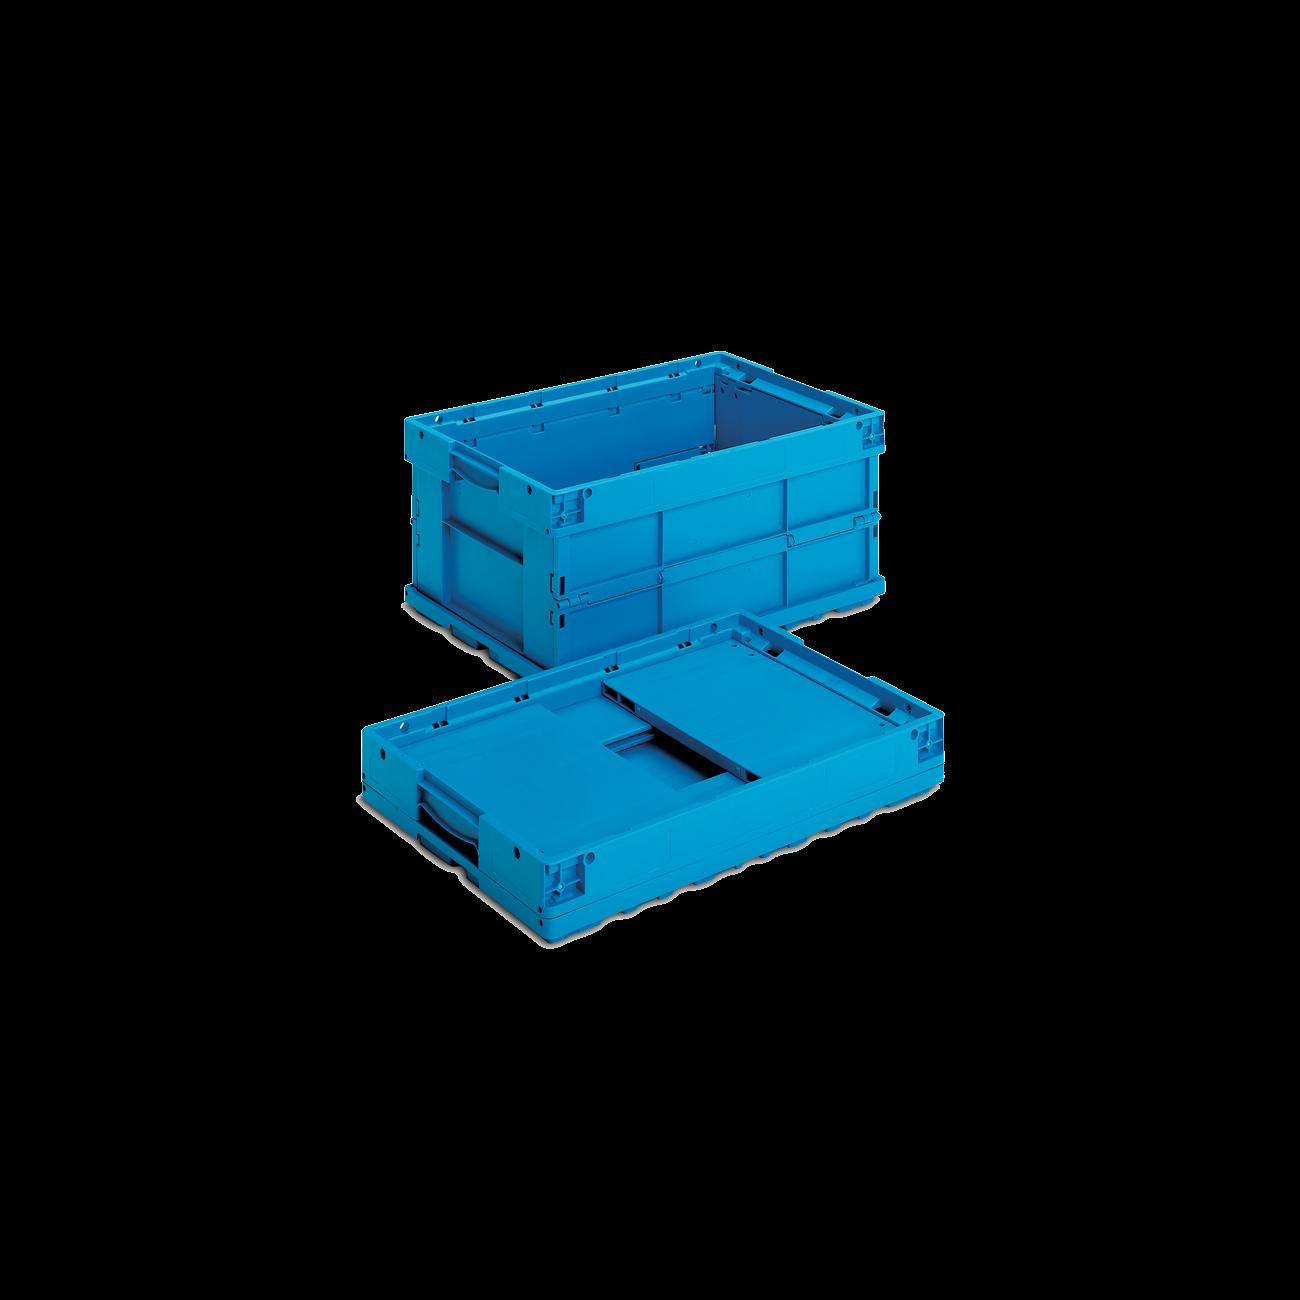 Plastic Foldable Crate VDA 6410, Automotive Industry